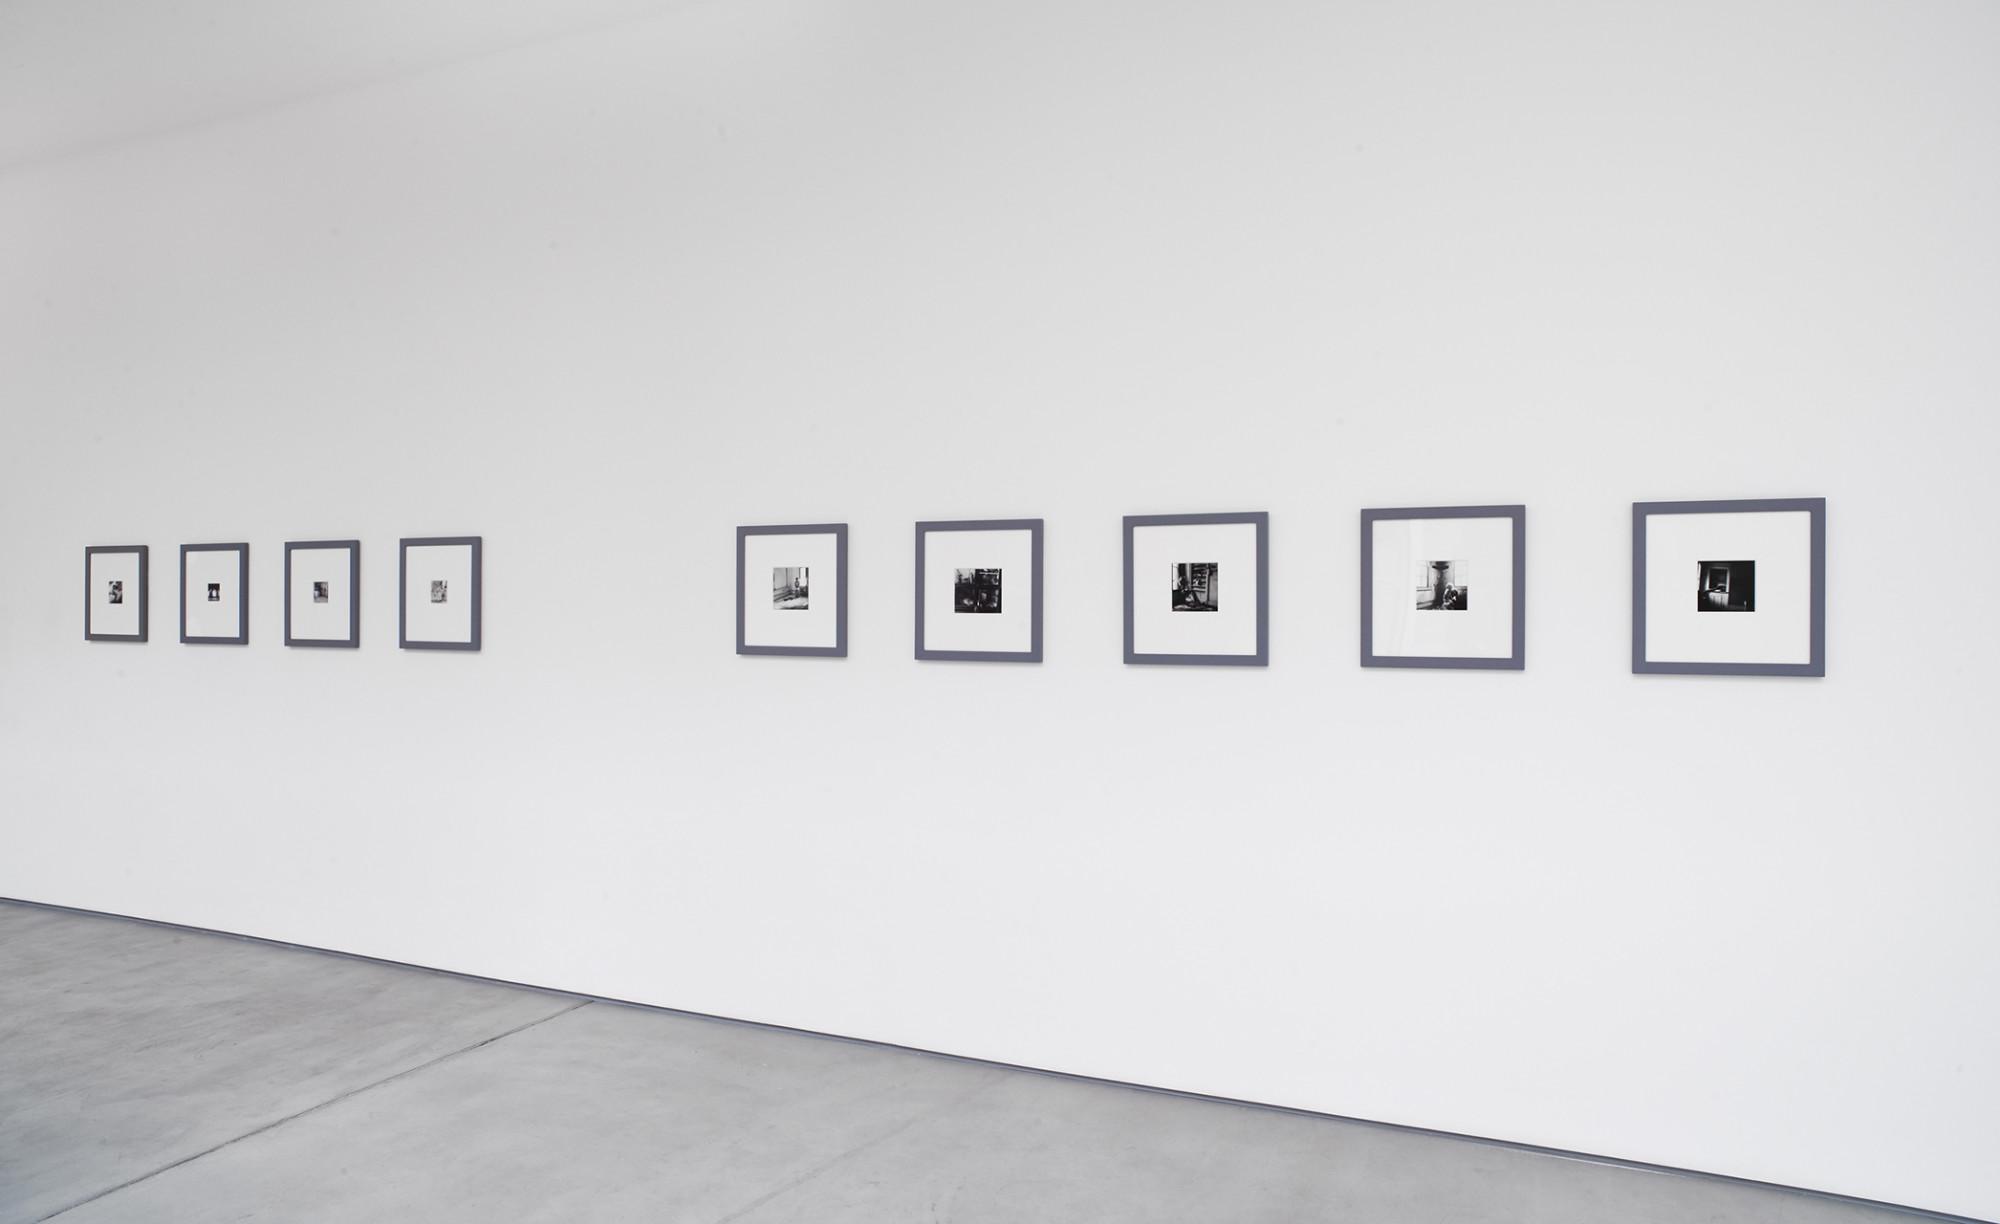 <p>Francesca Woodman, installation view, 2017</p>